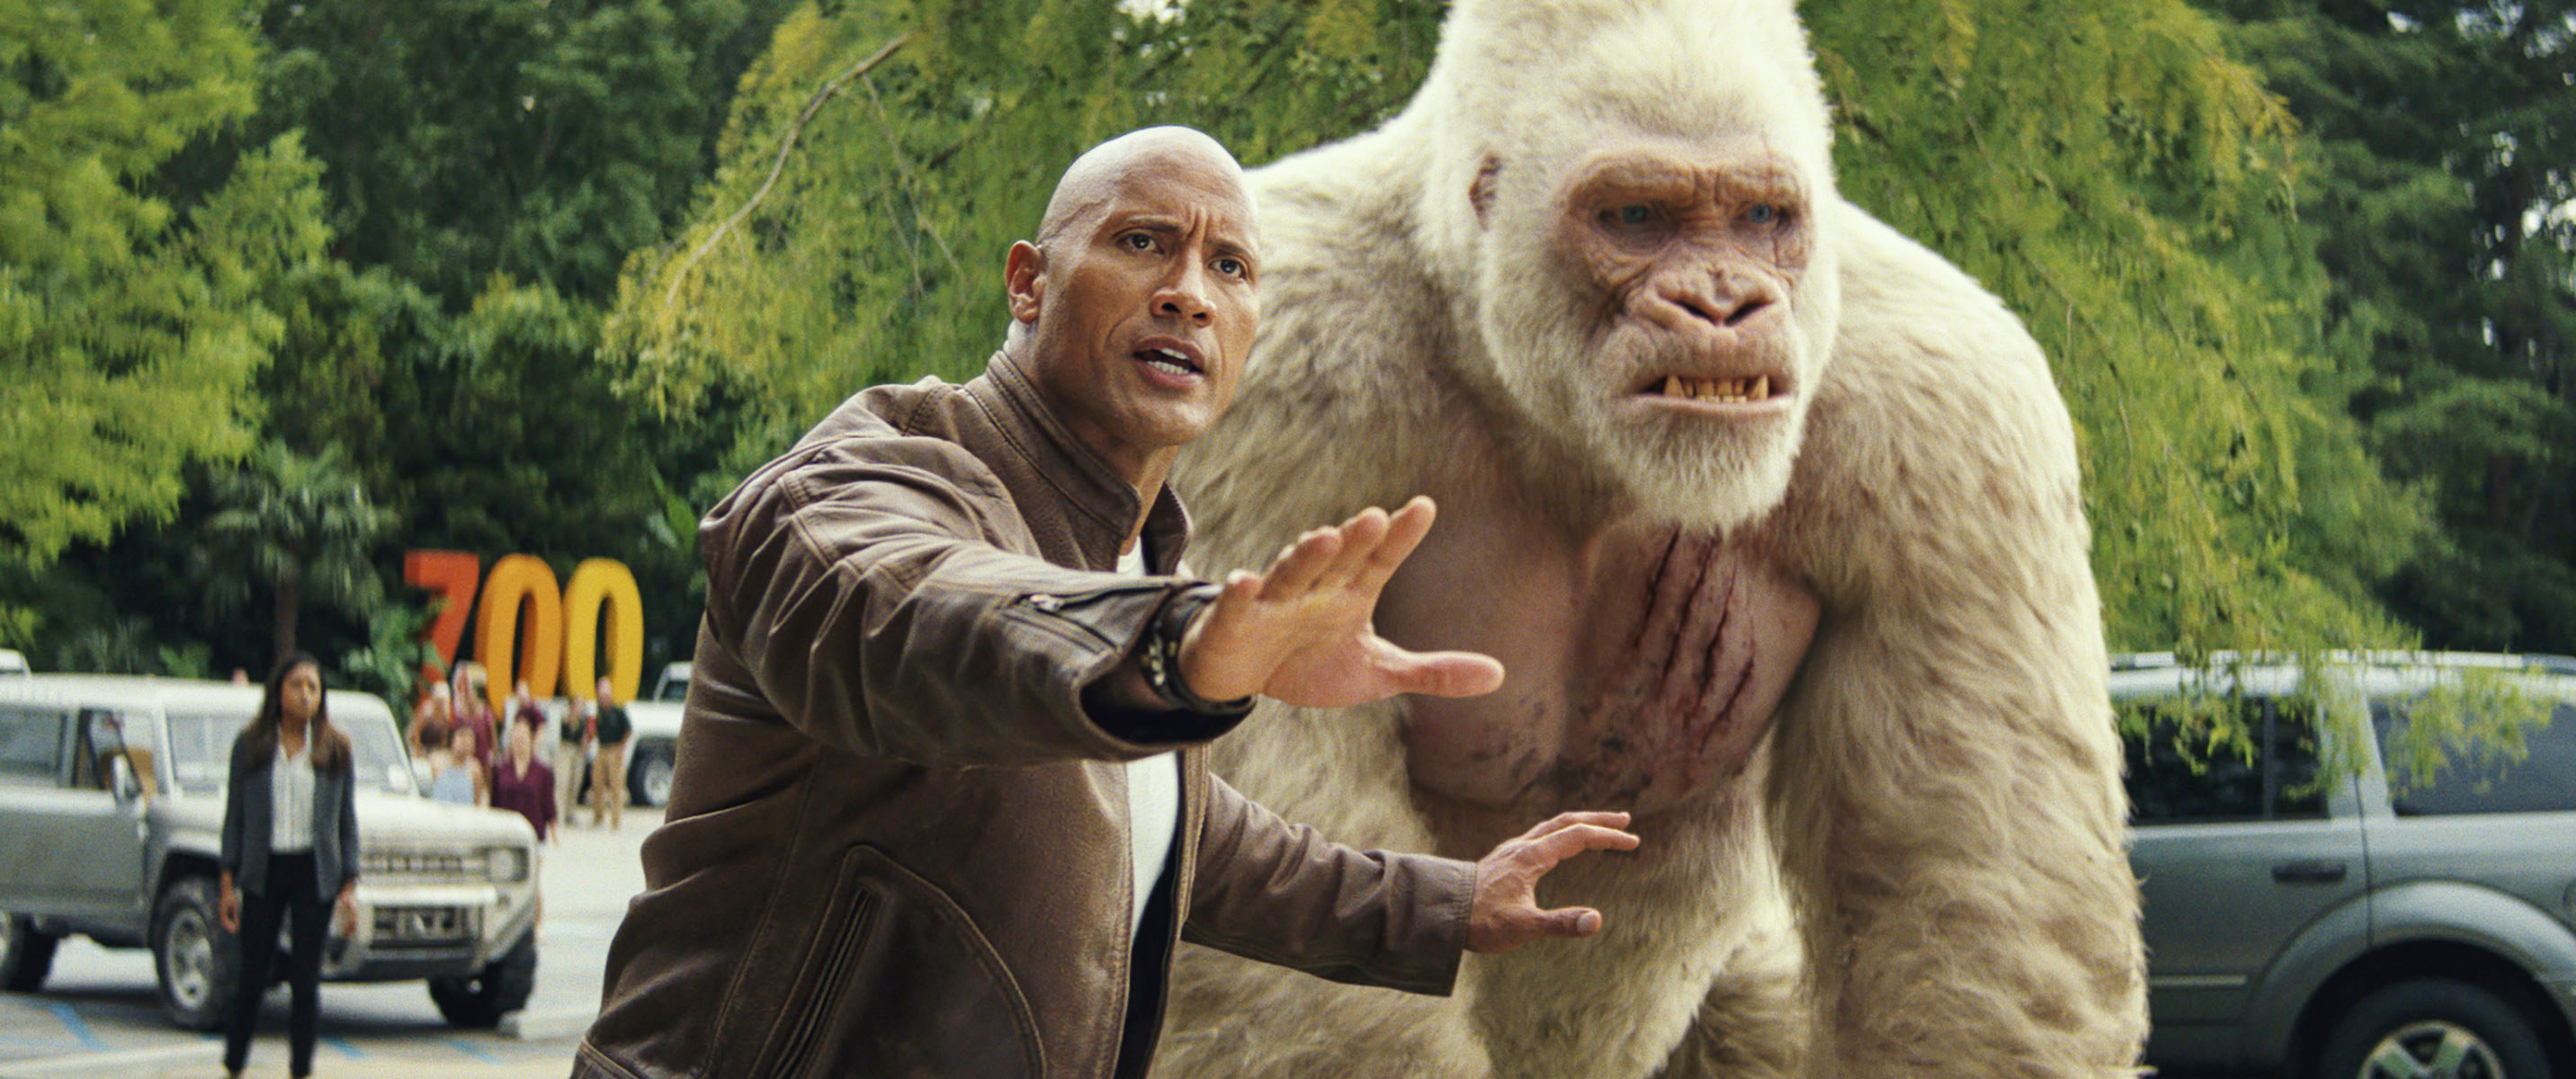 Dwayne Johnson with his white gorilla sidekick, George